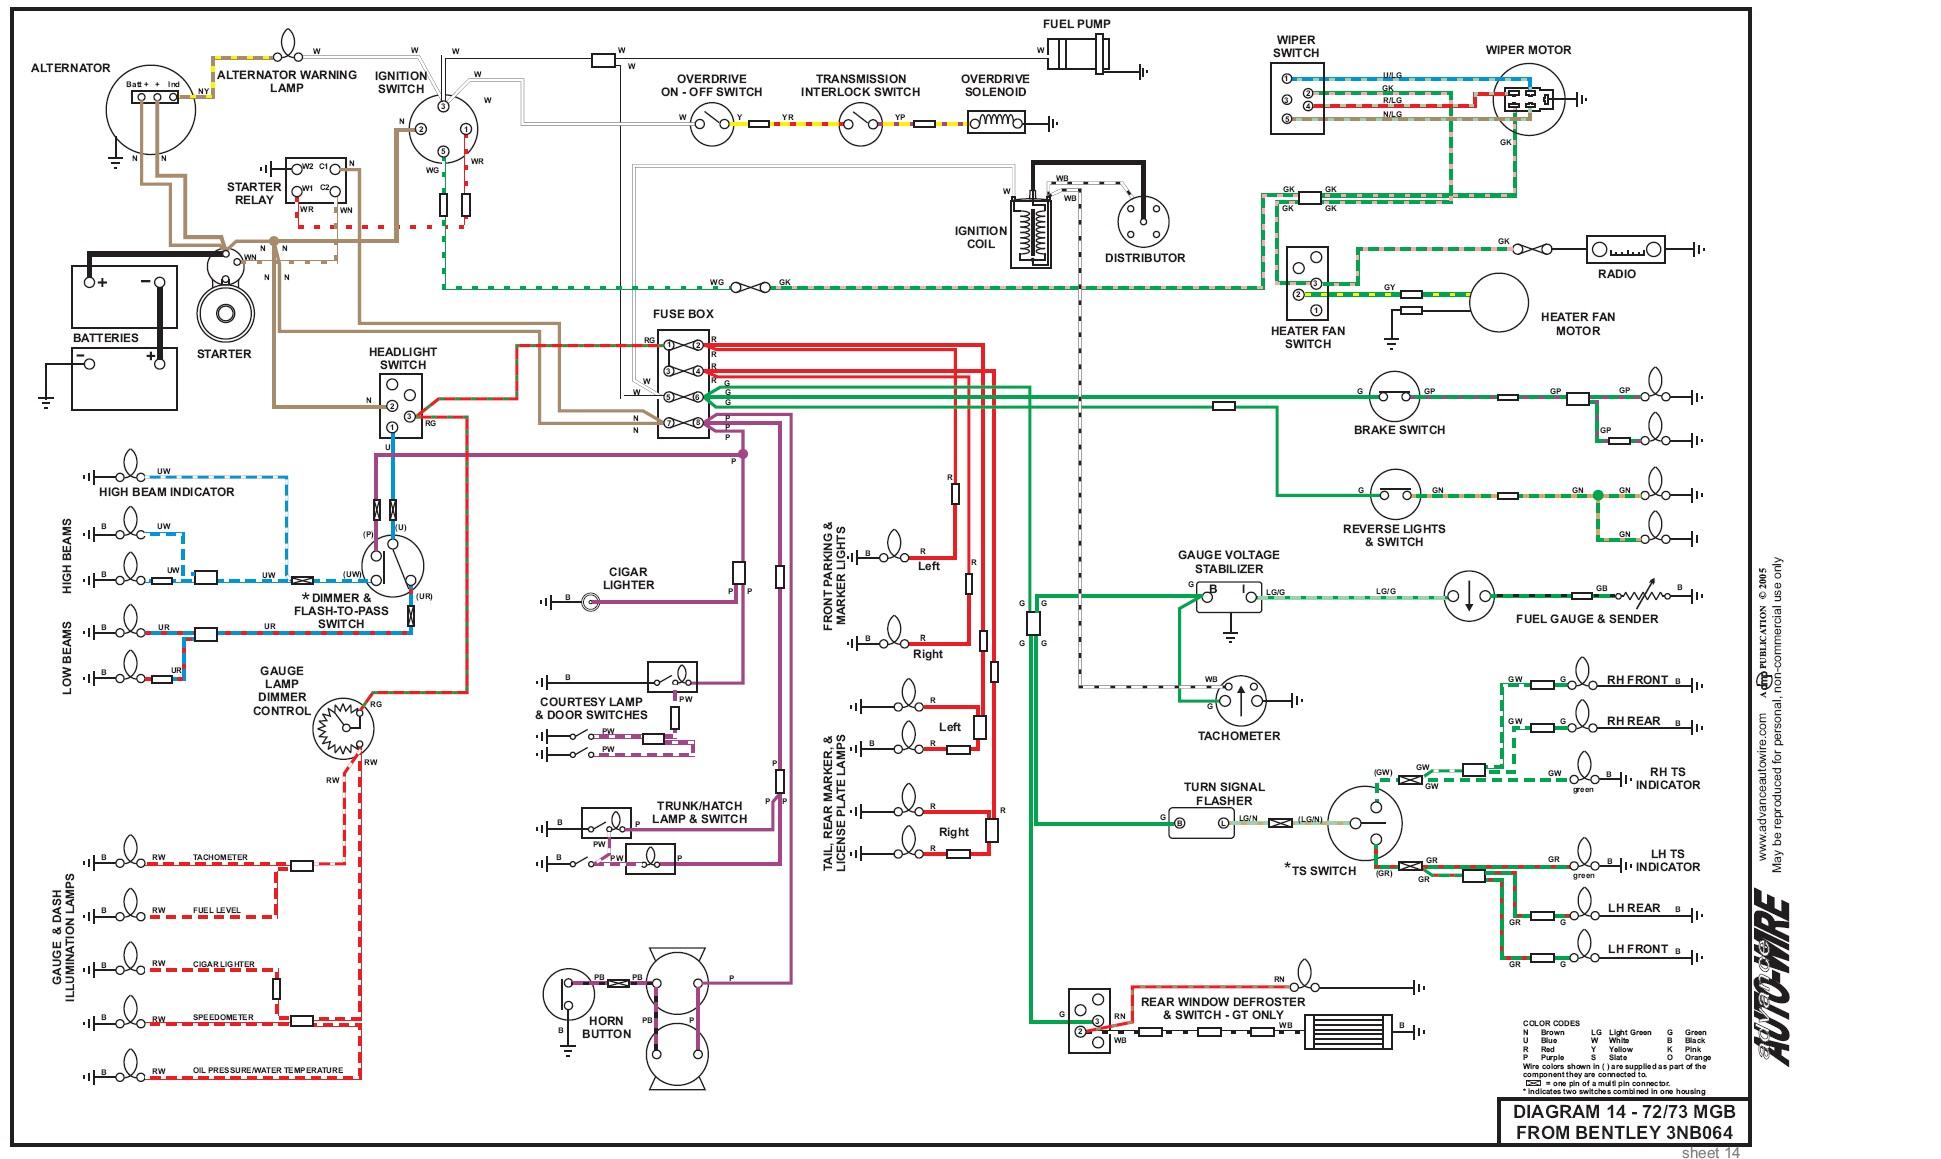 mg midget wiring diagram online wiring diagram good gt wiring harness read all diagram